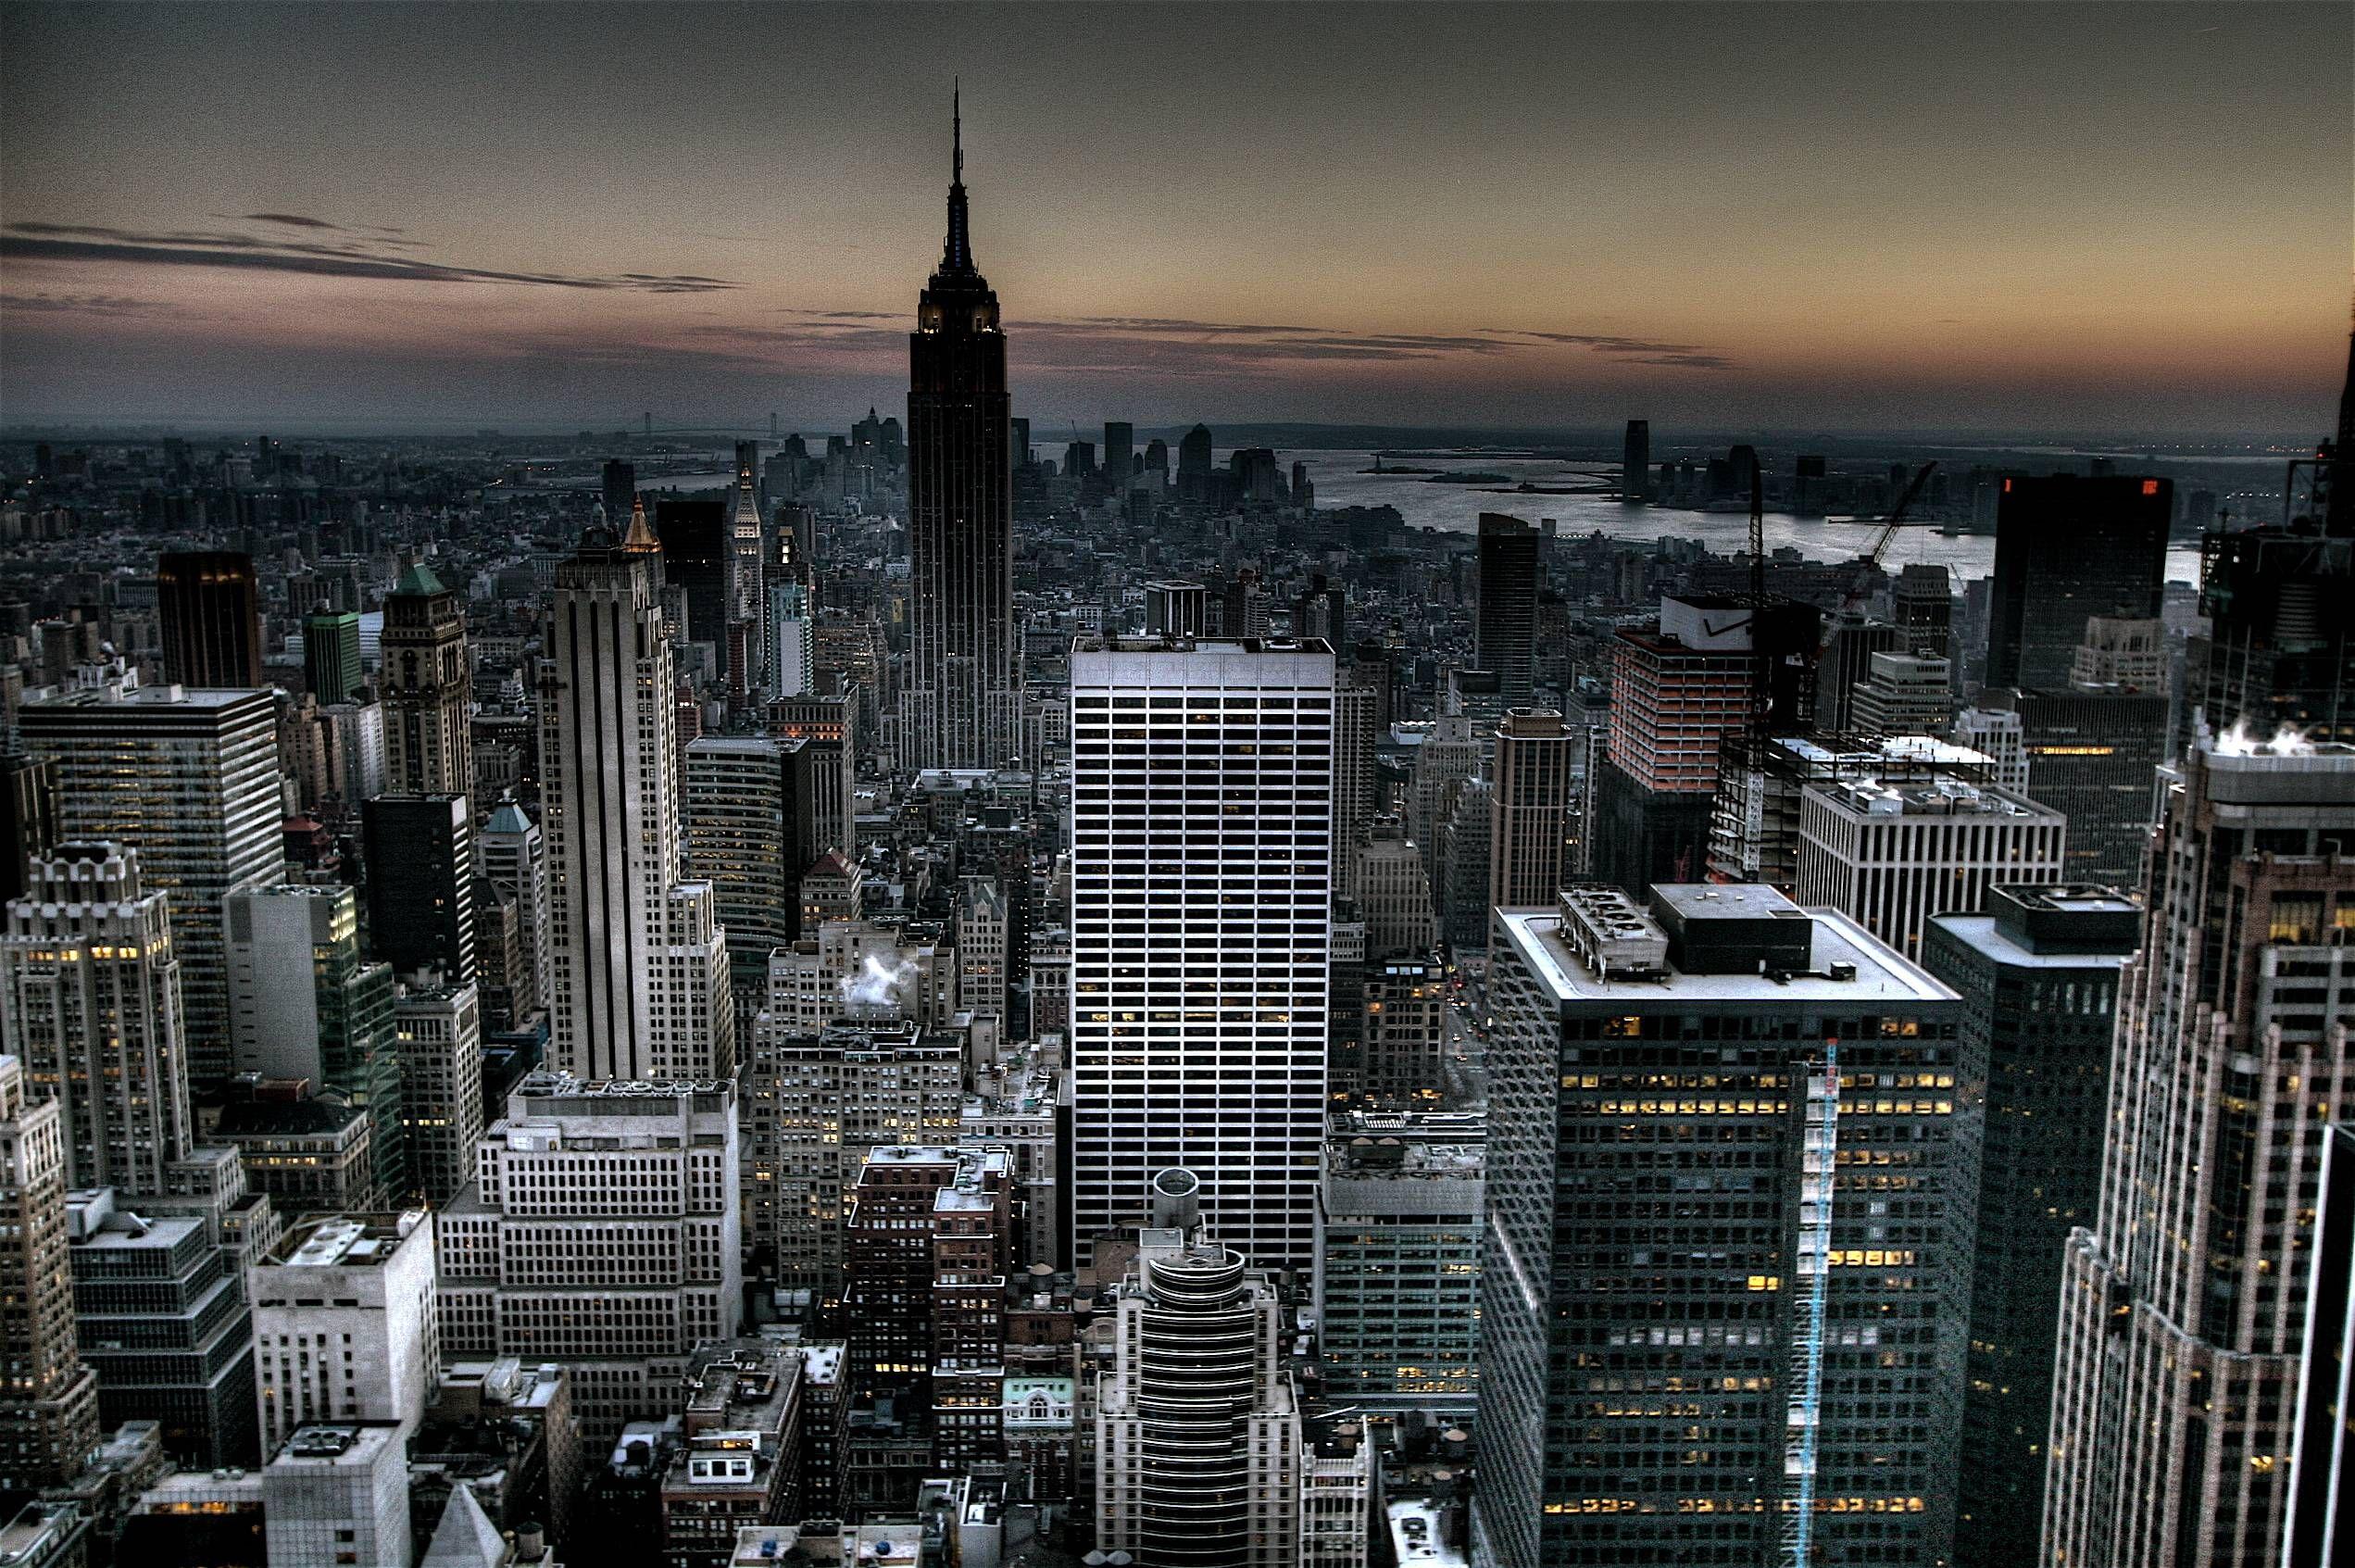 New York Desktop Background New York City Background City Skyline Wallpaper New York Wallpaper